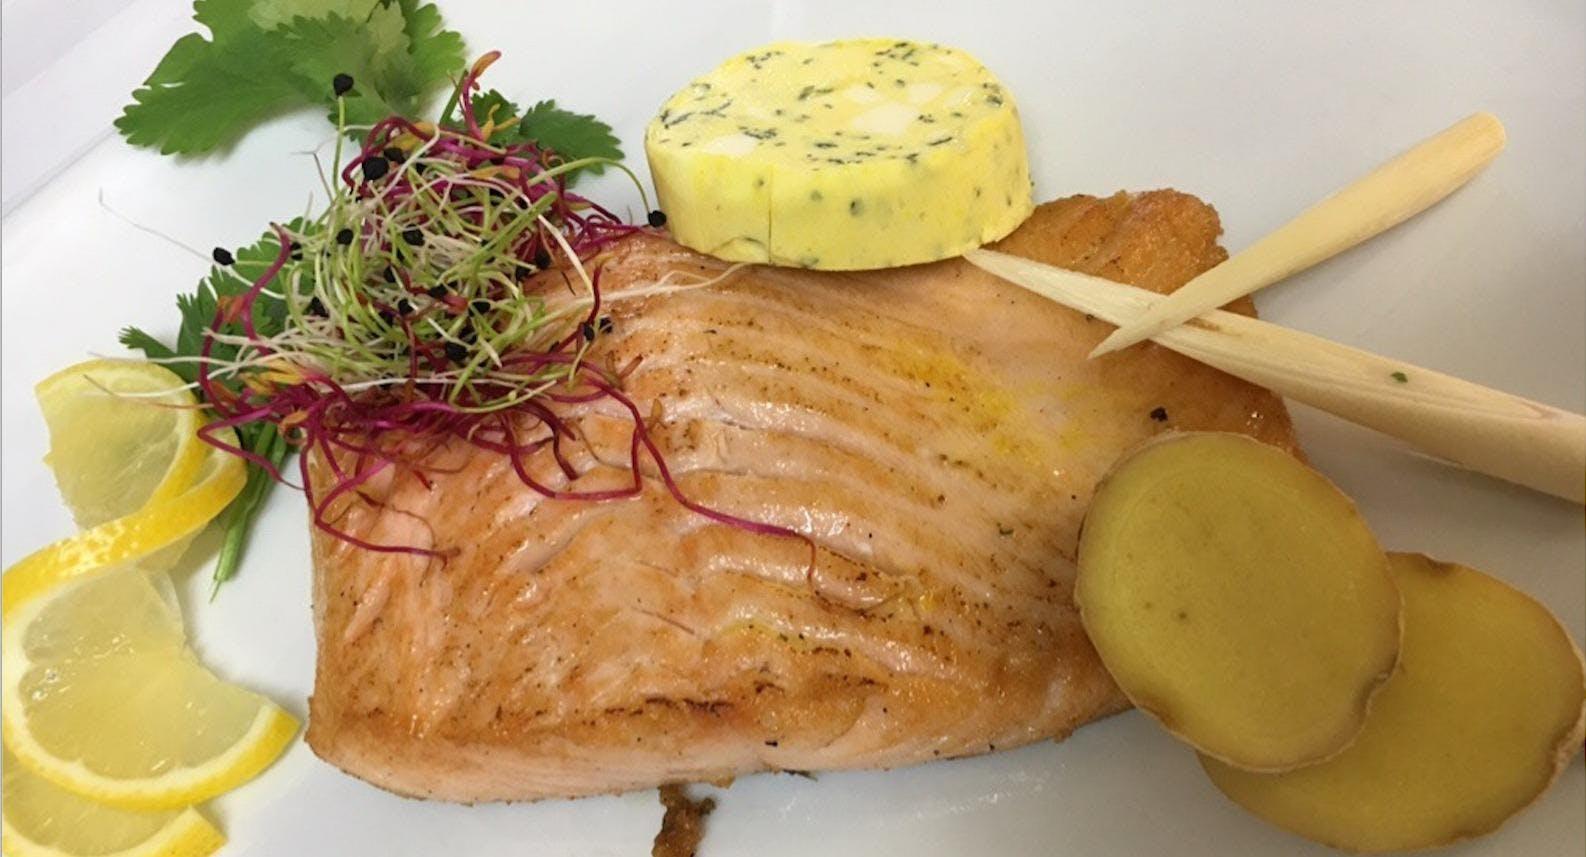 Erlebnisrestaurant Triibhuus Zurigo image 3